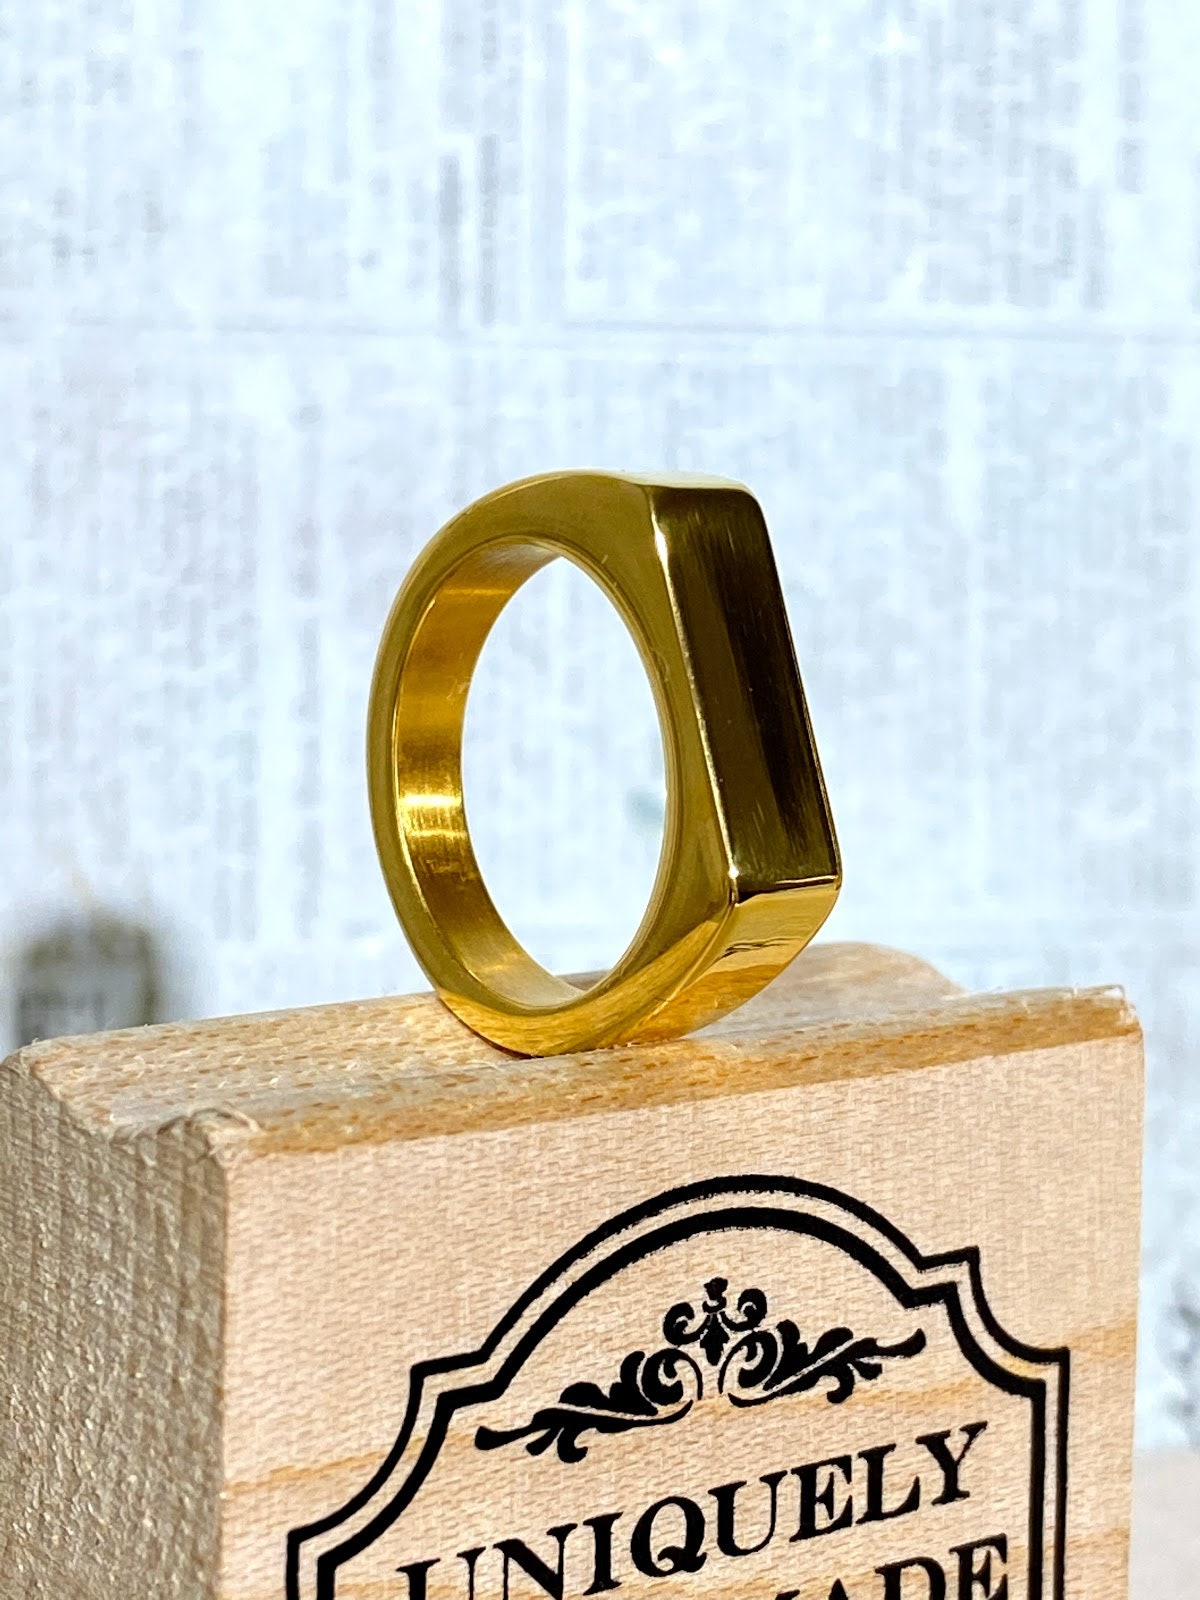 14k Gold 5X layered steel Unisex Ring Sizes 8 to 10  Warranty Gift for him Gift for her Ring Dollar Men/'s Women Designer Band Ring